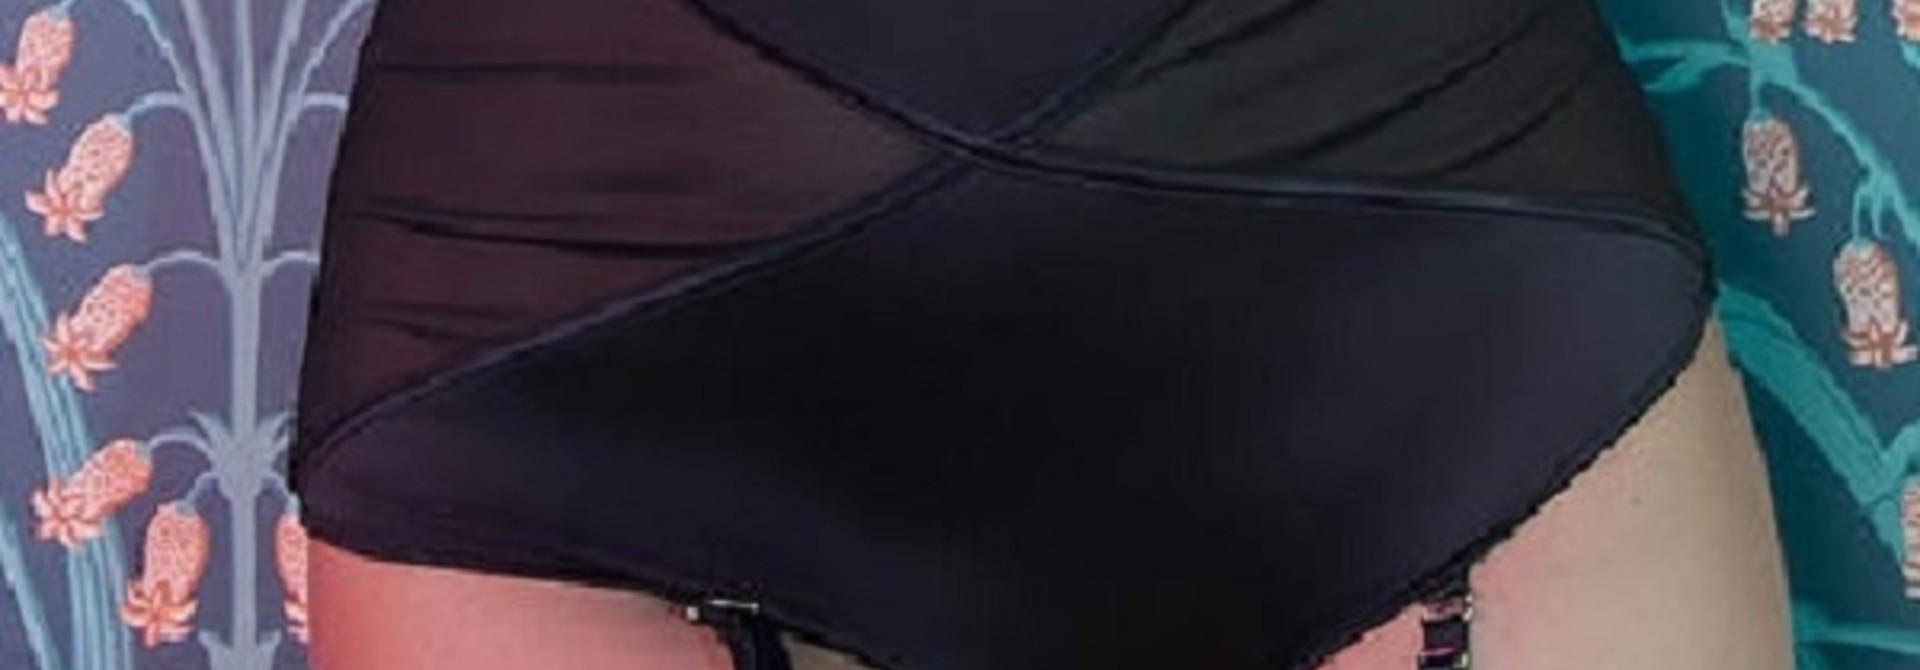 Zwart Satijnen Taille Broekje